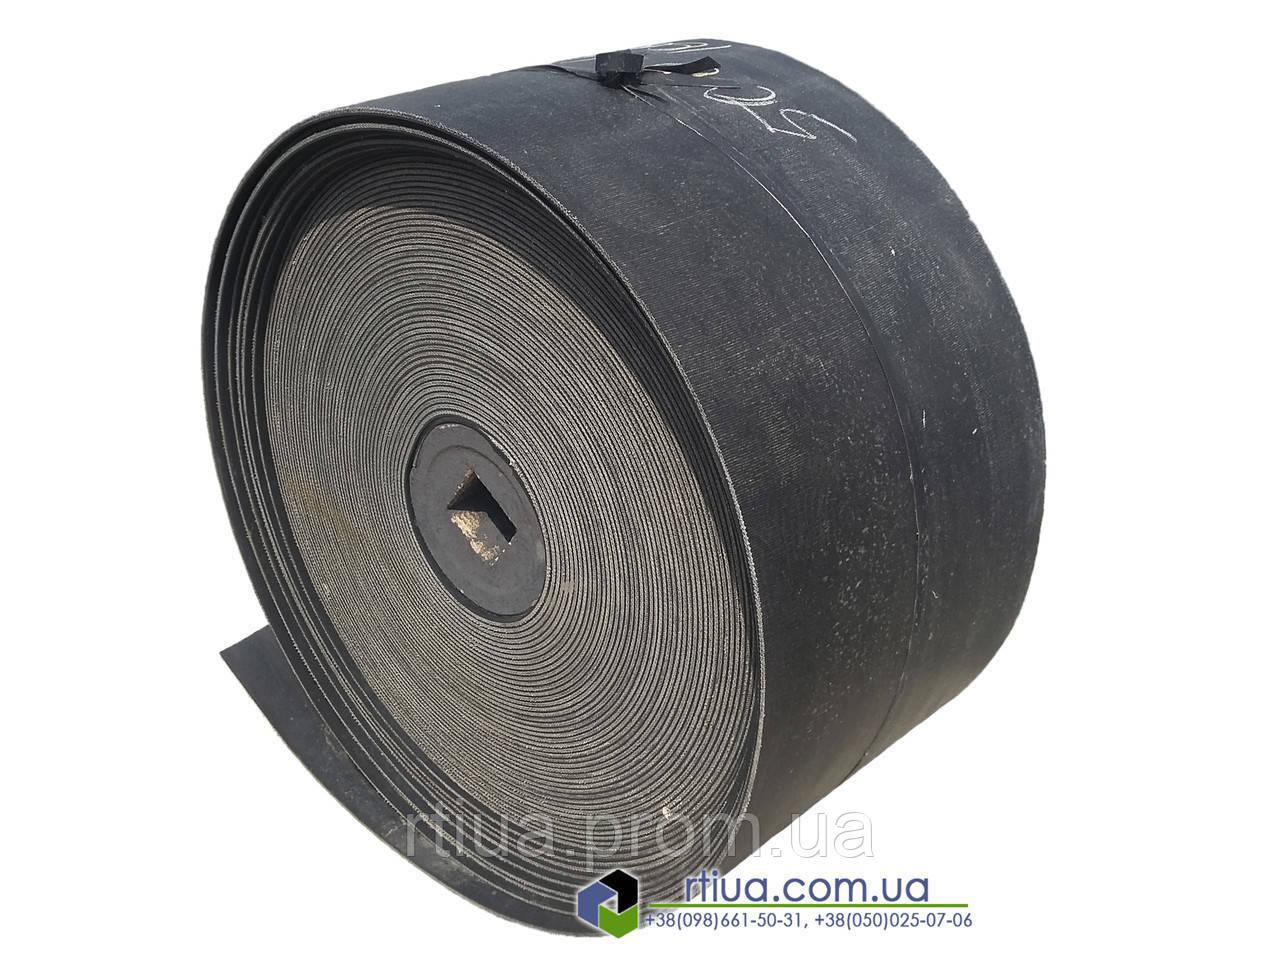 Конвейерная лента 125х4 мм